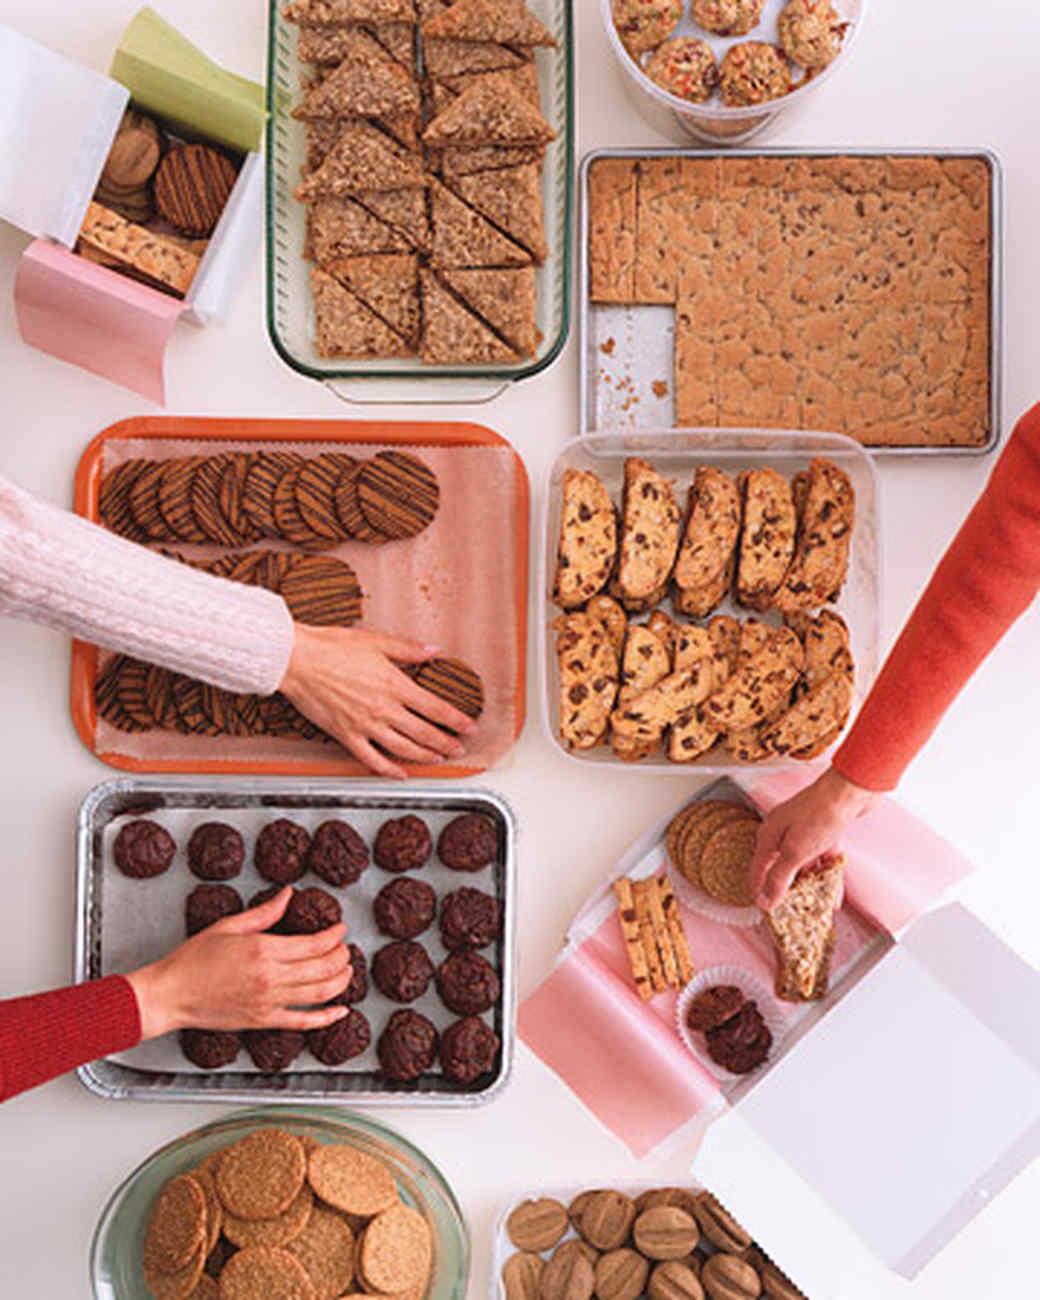 a100264_hol03_allcookies.jpg